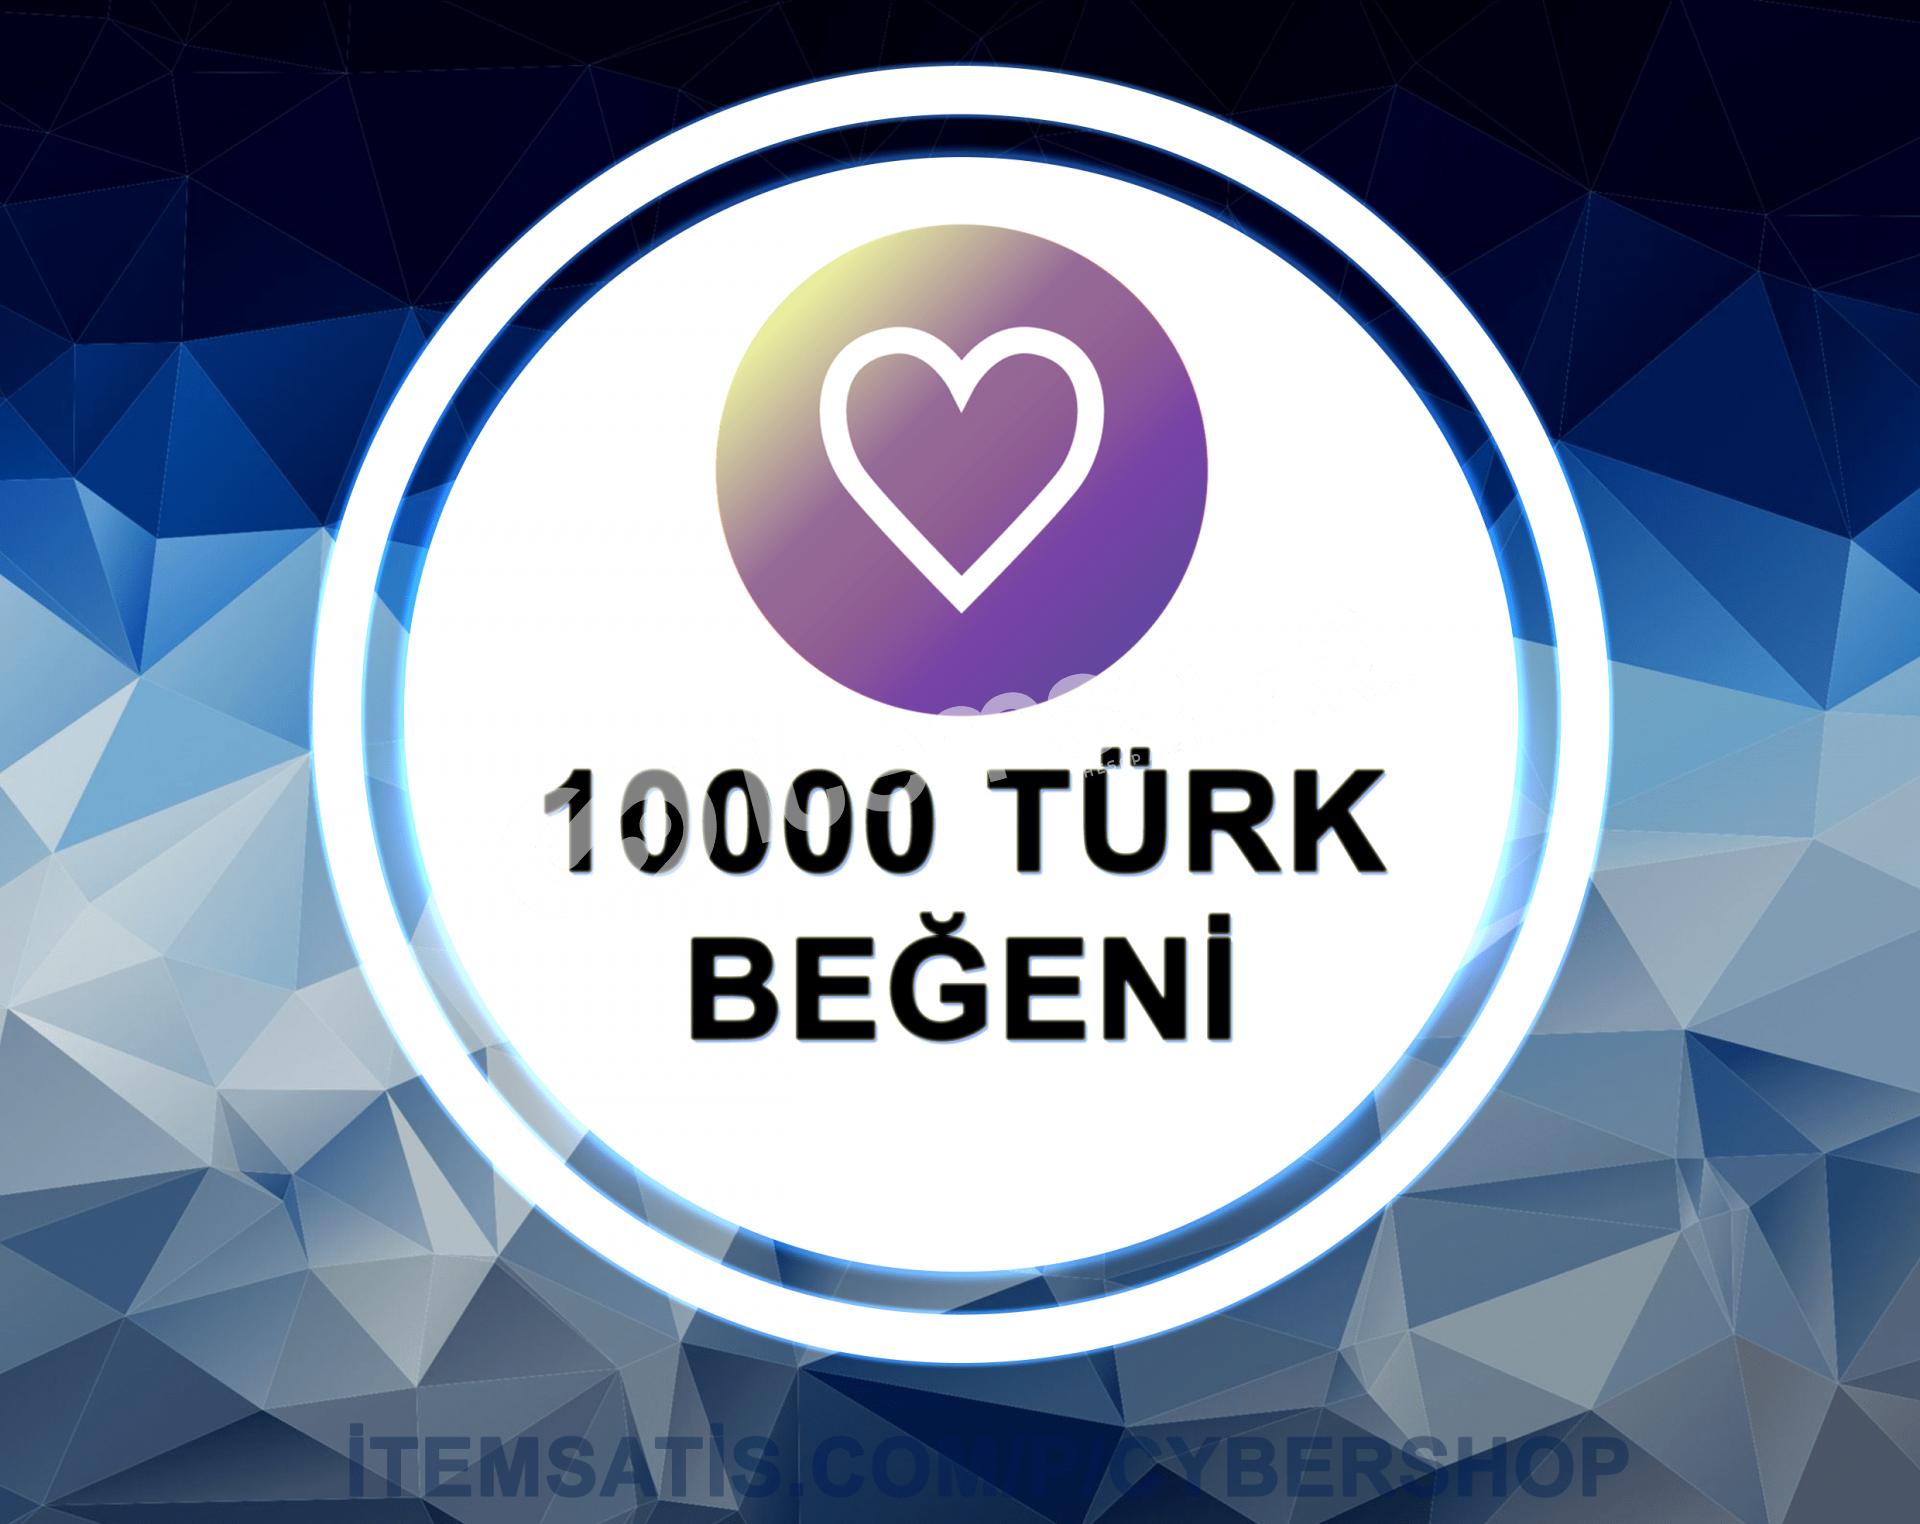 10.000 [TÜRK] Beğeni Paketi